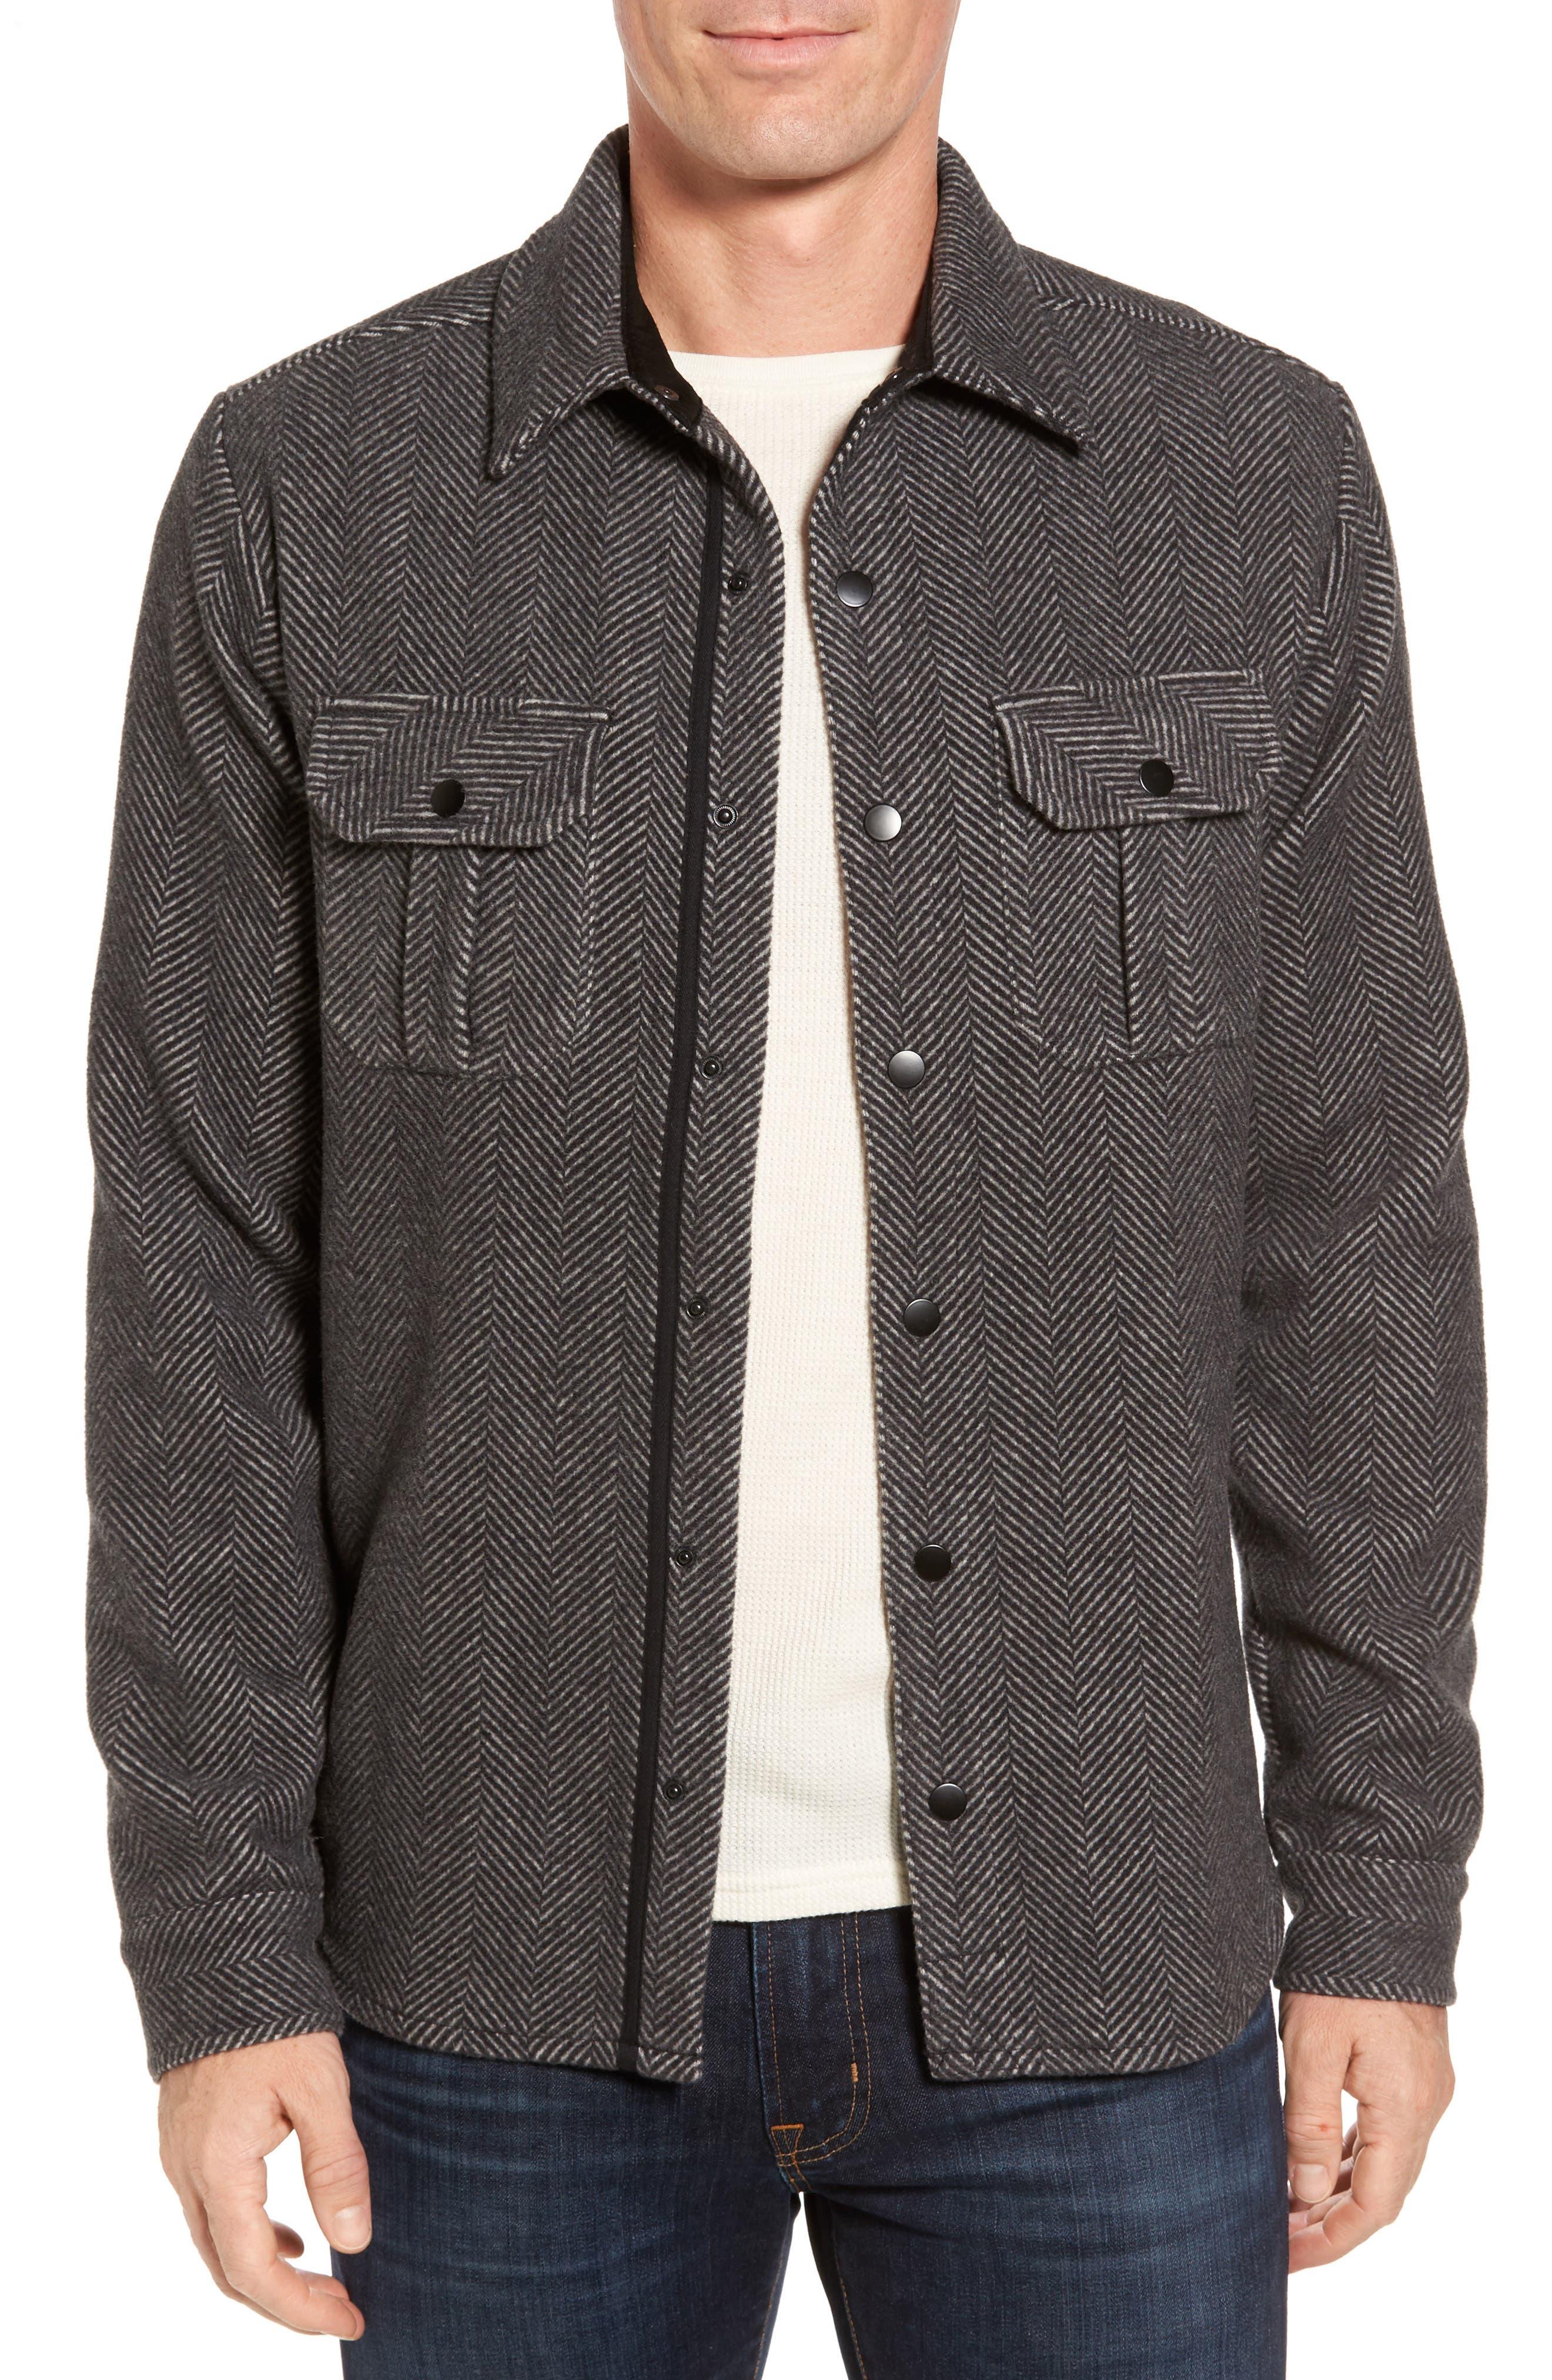 Anchor Line Herringbone Wool Blend Shirt Jacket,                         Main,                         color,